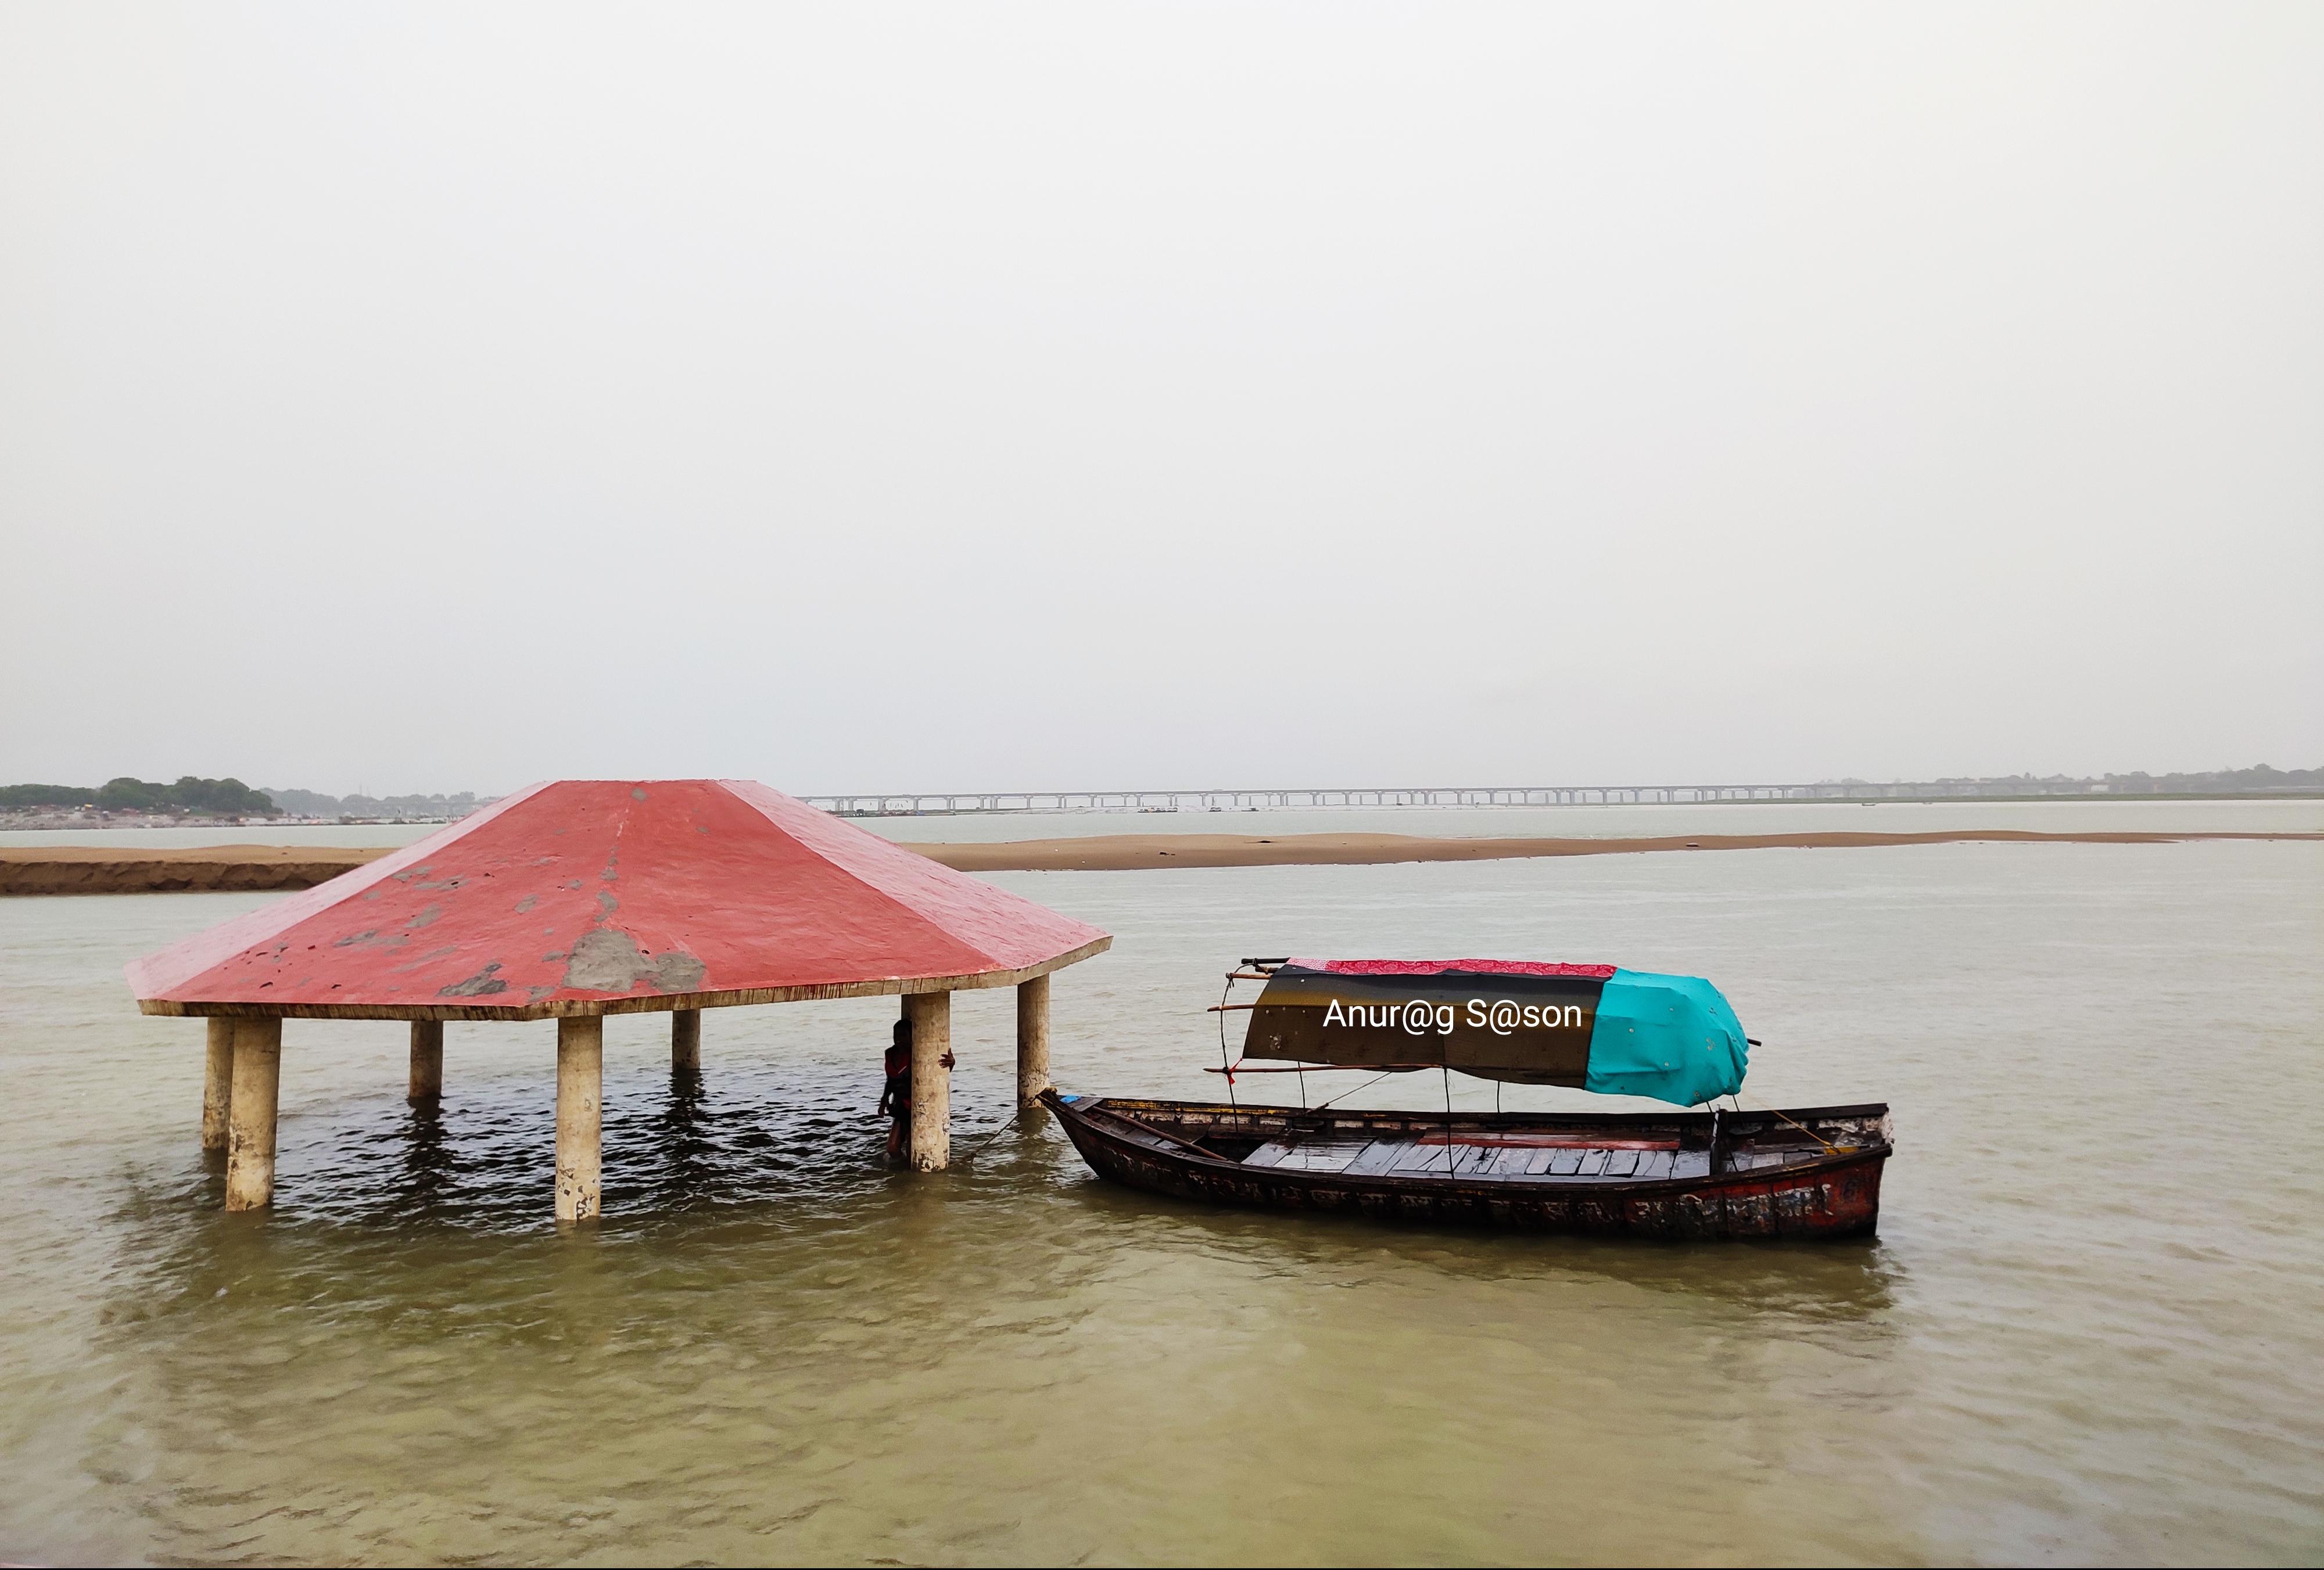 Triveni Sangam, pic of the day, Anurag Sason,